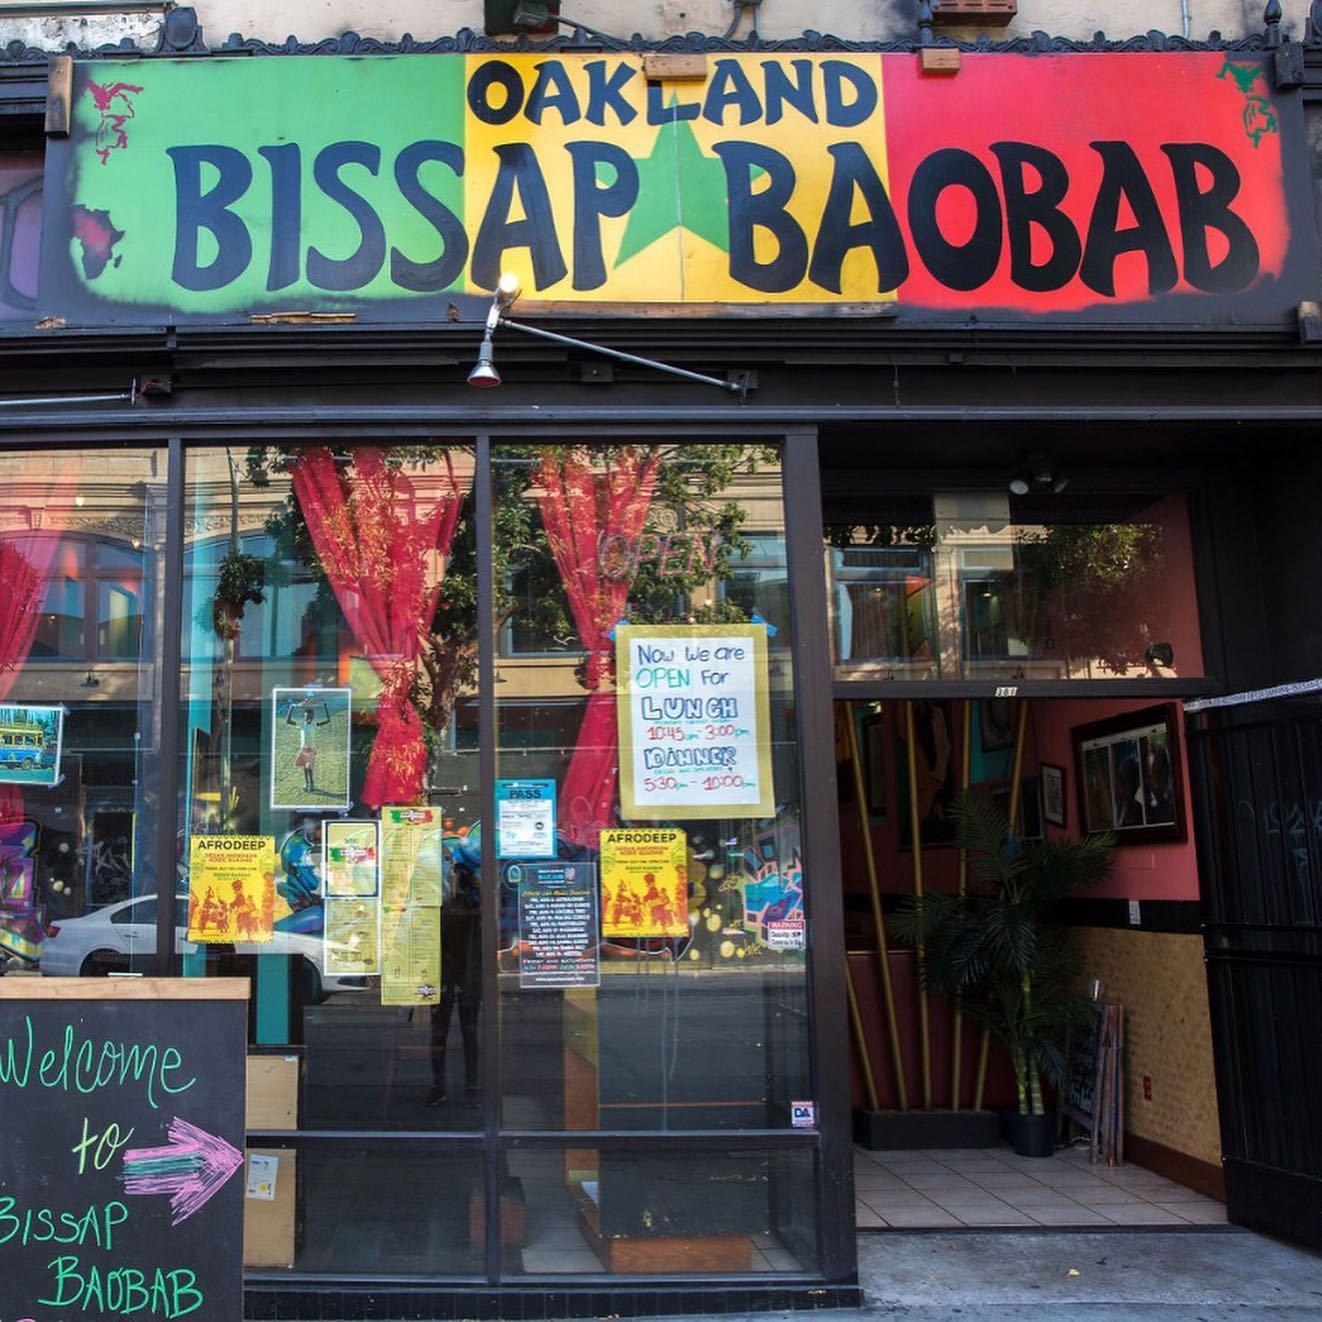 Senegalese Restaurant Bissap Baobab Will Close Its Oakland Location